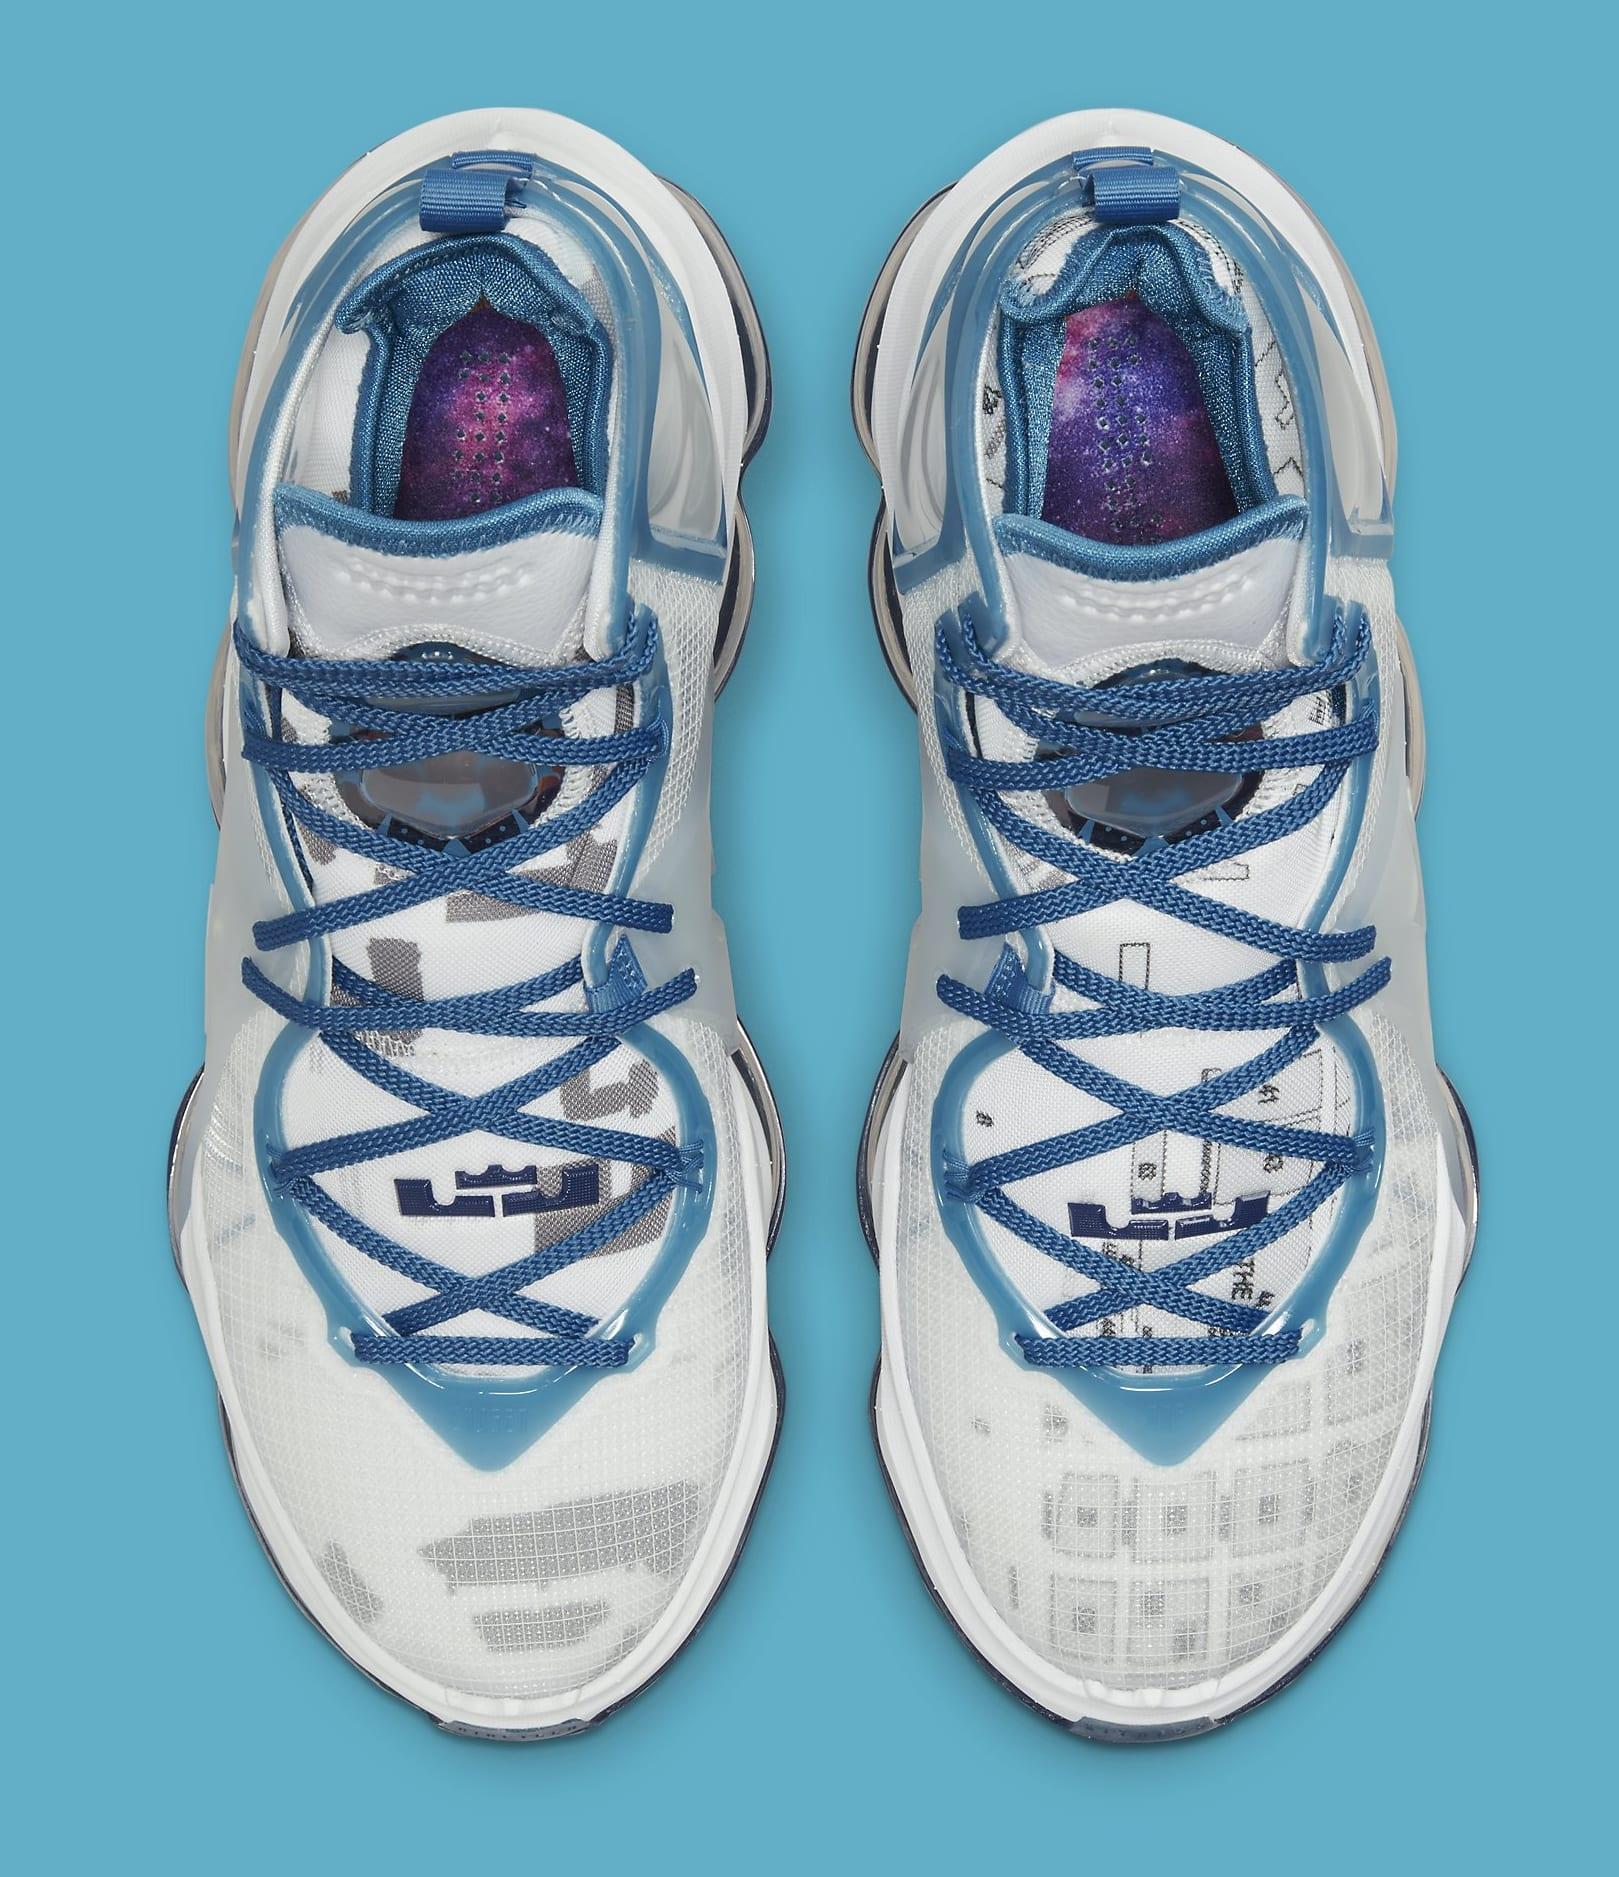 Nike LeBron 19 'Space Jam' DC9338-100 Top